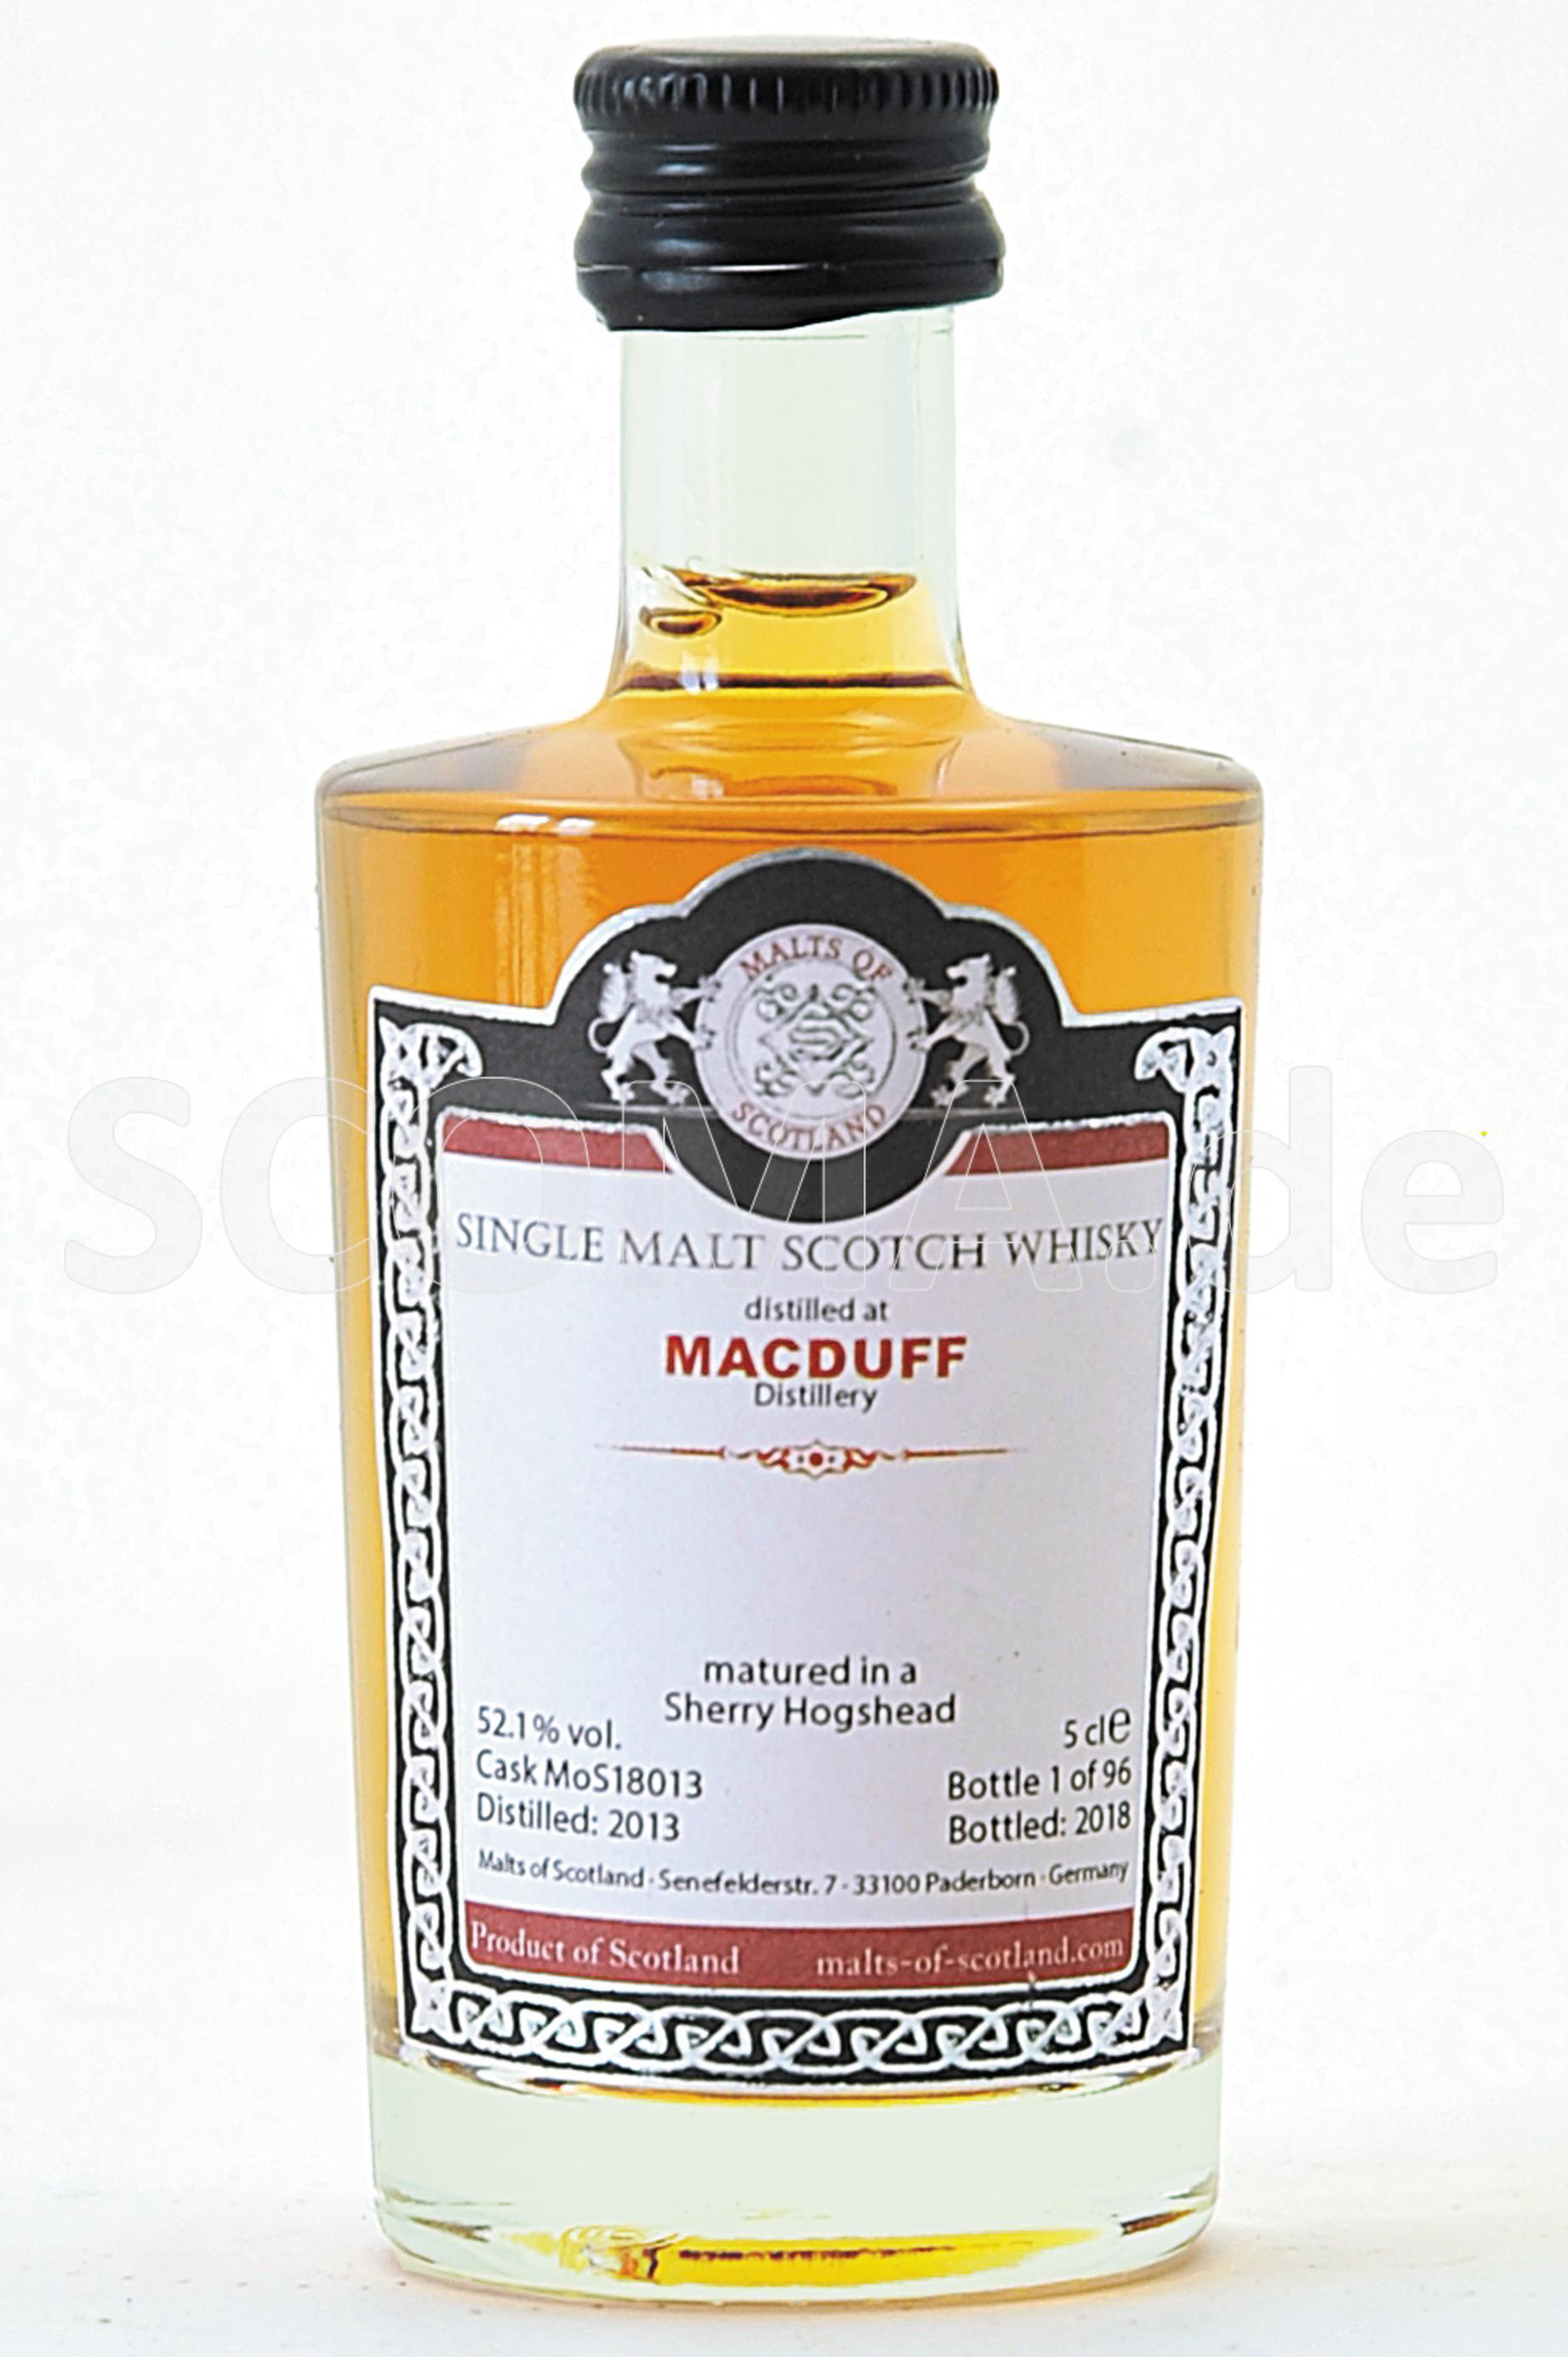 Macduff 2013/2018 Sherry Cask